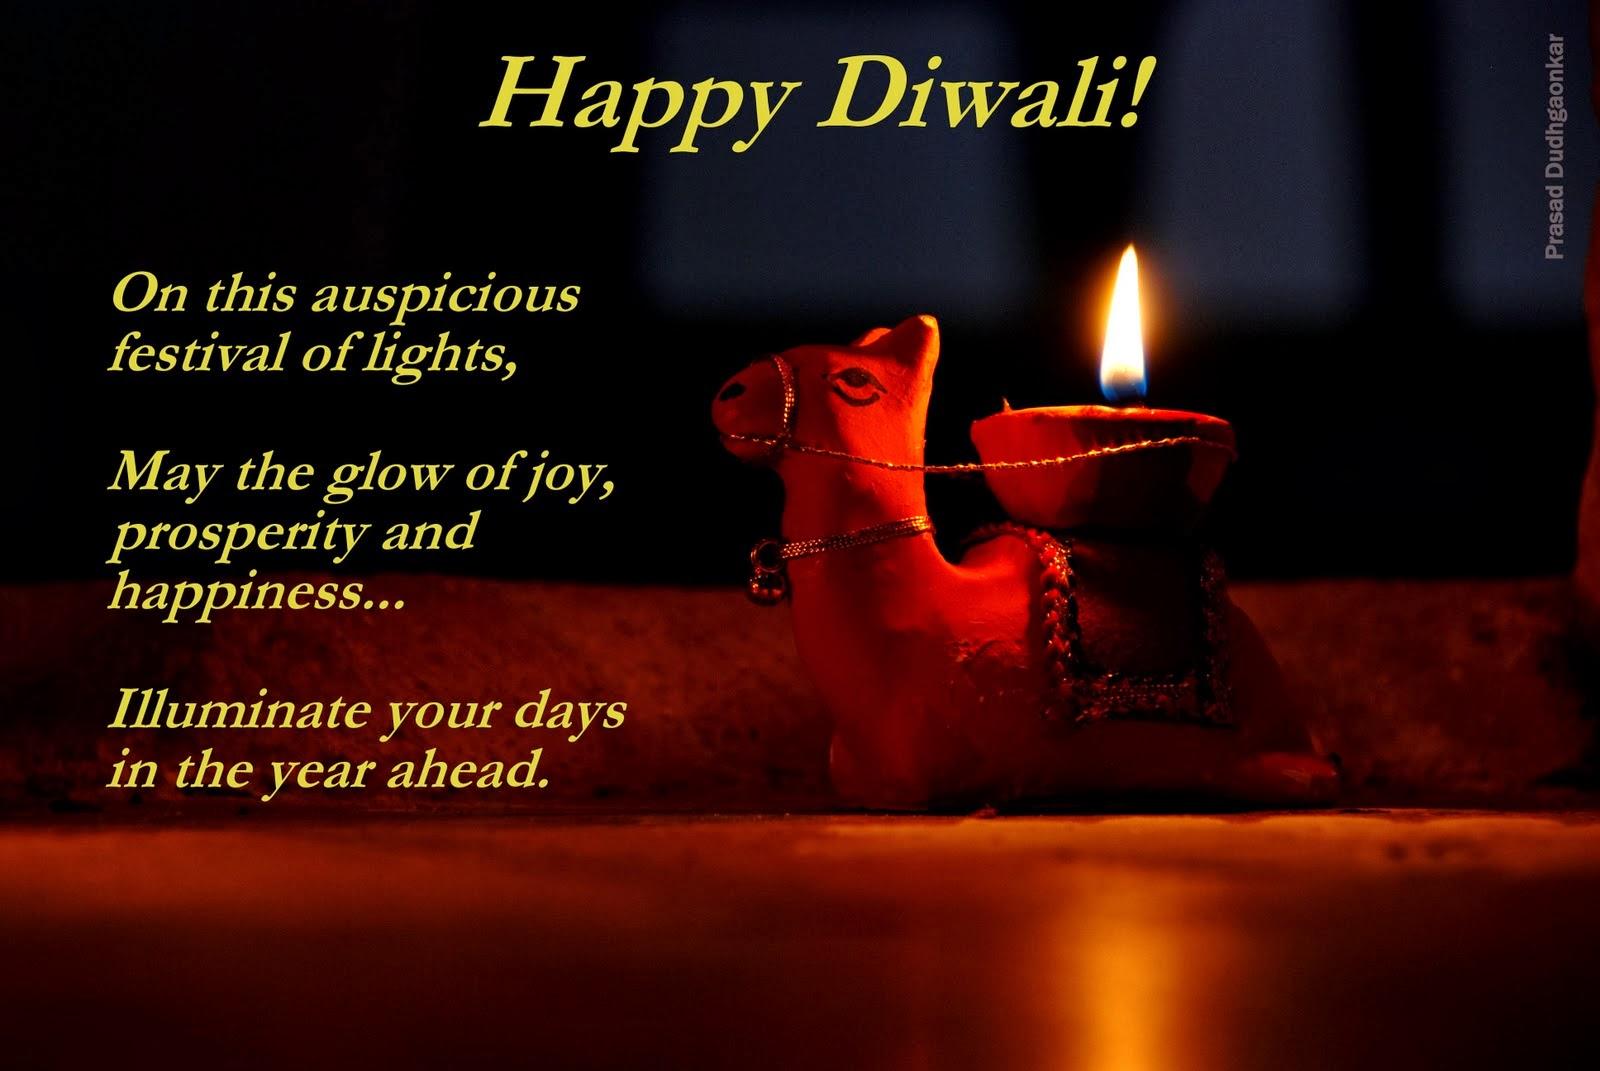 Sadhguru Wallpaper Quotes Picturespool Happy Diwali Wishes Greetings 2013